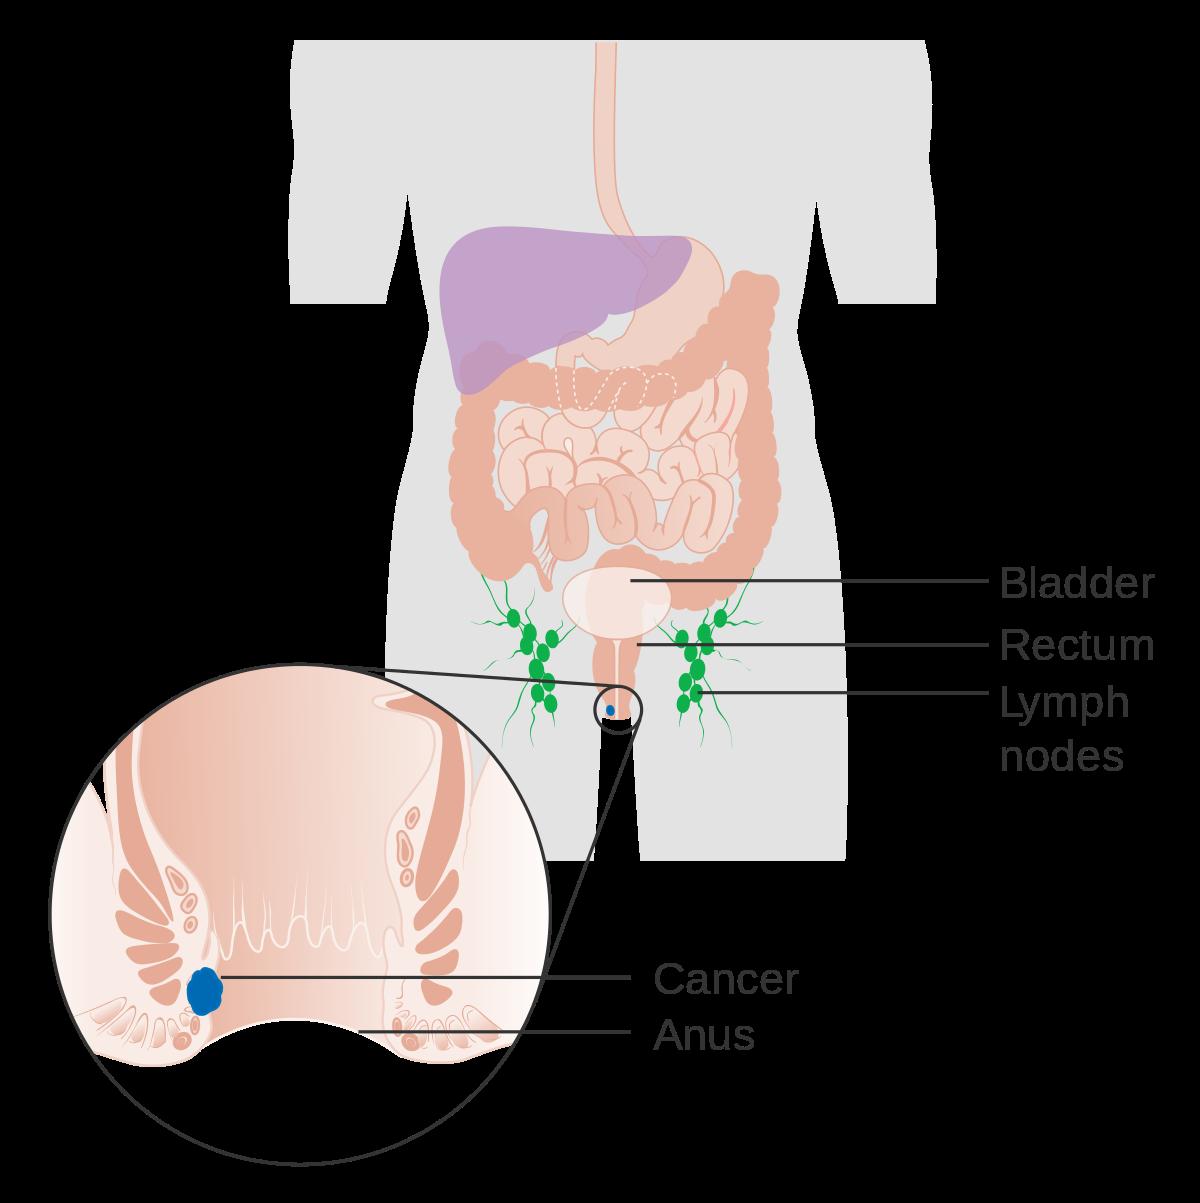 metastatic cancer buttock pain papillary urothelial neoplasm punlmp